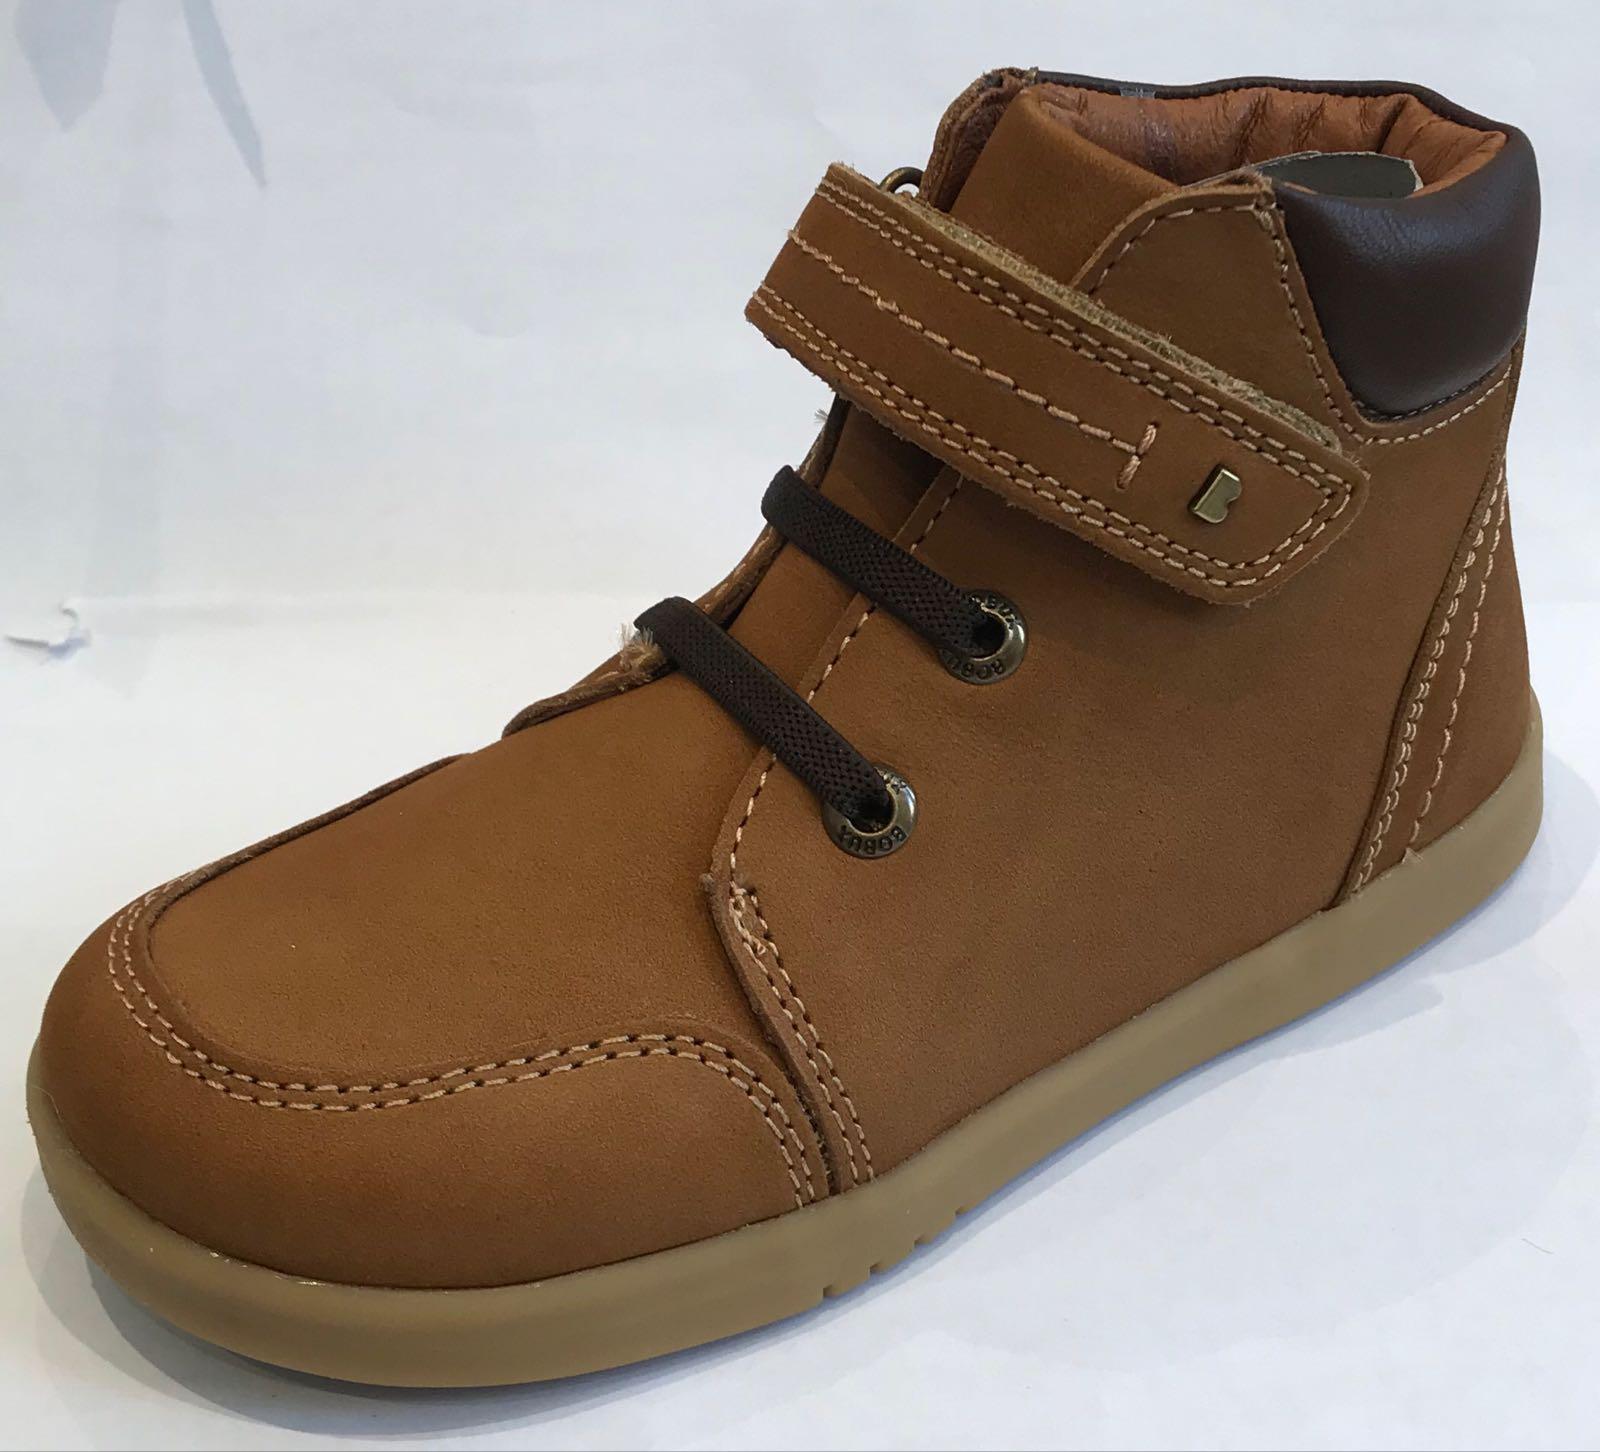 Bobux KP Timber Boot, Mustard